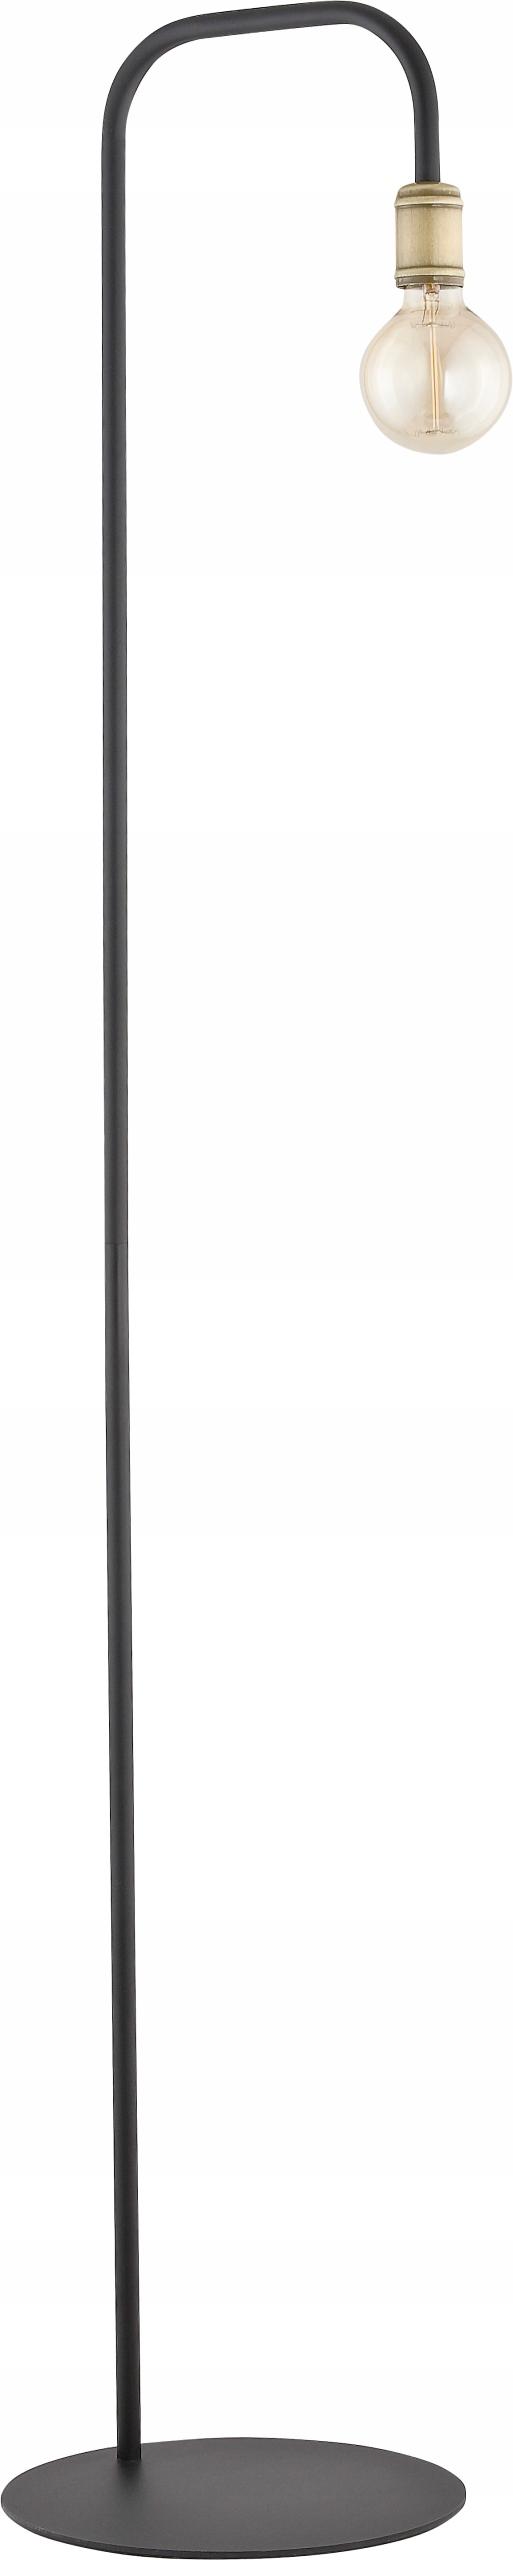 Svietidlo RETRO PATYNA 3024 Tk osvetlenie GALAXYLAMP